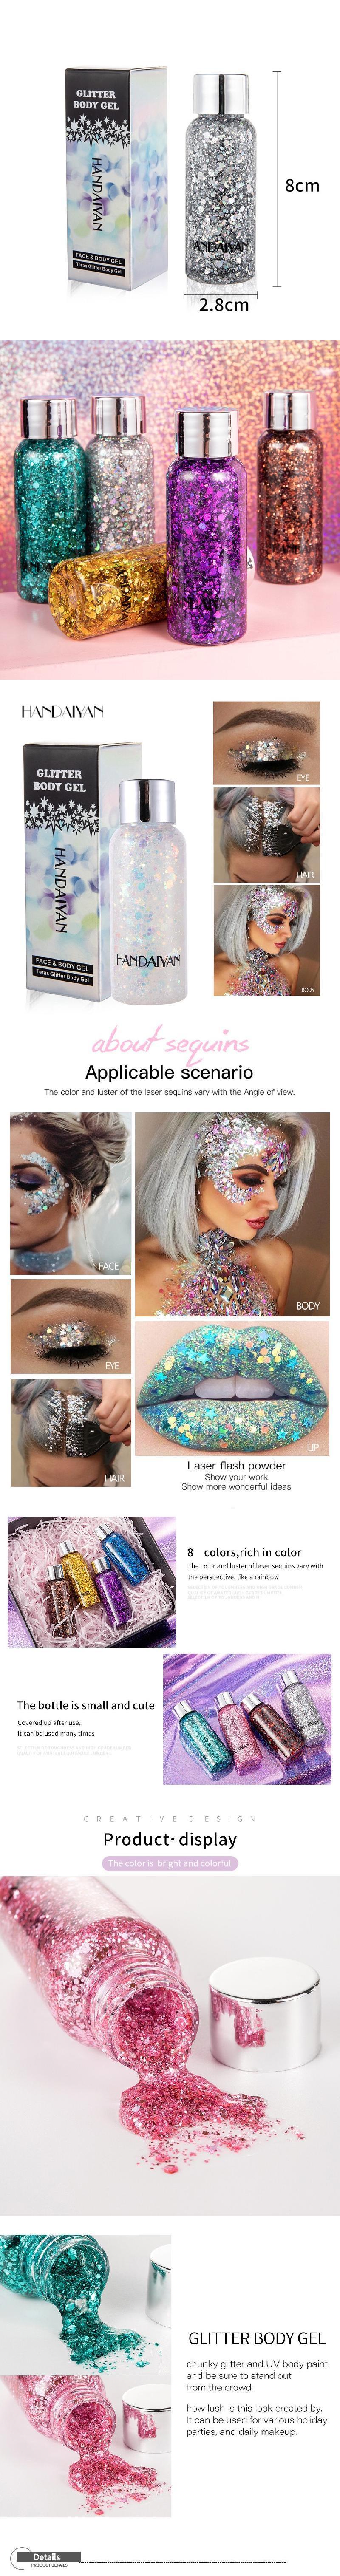 Long Lasting Metallic Liquid eyeshadow Private Label loose glitter eyeshadow cosmetic loose glitter eyeshadow